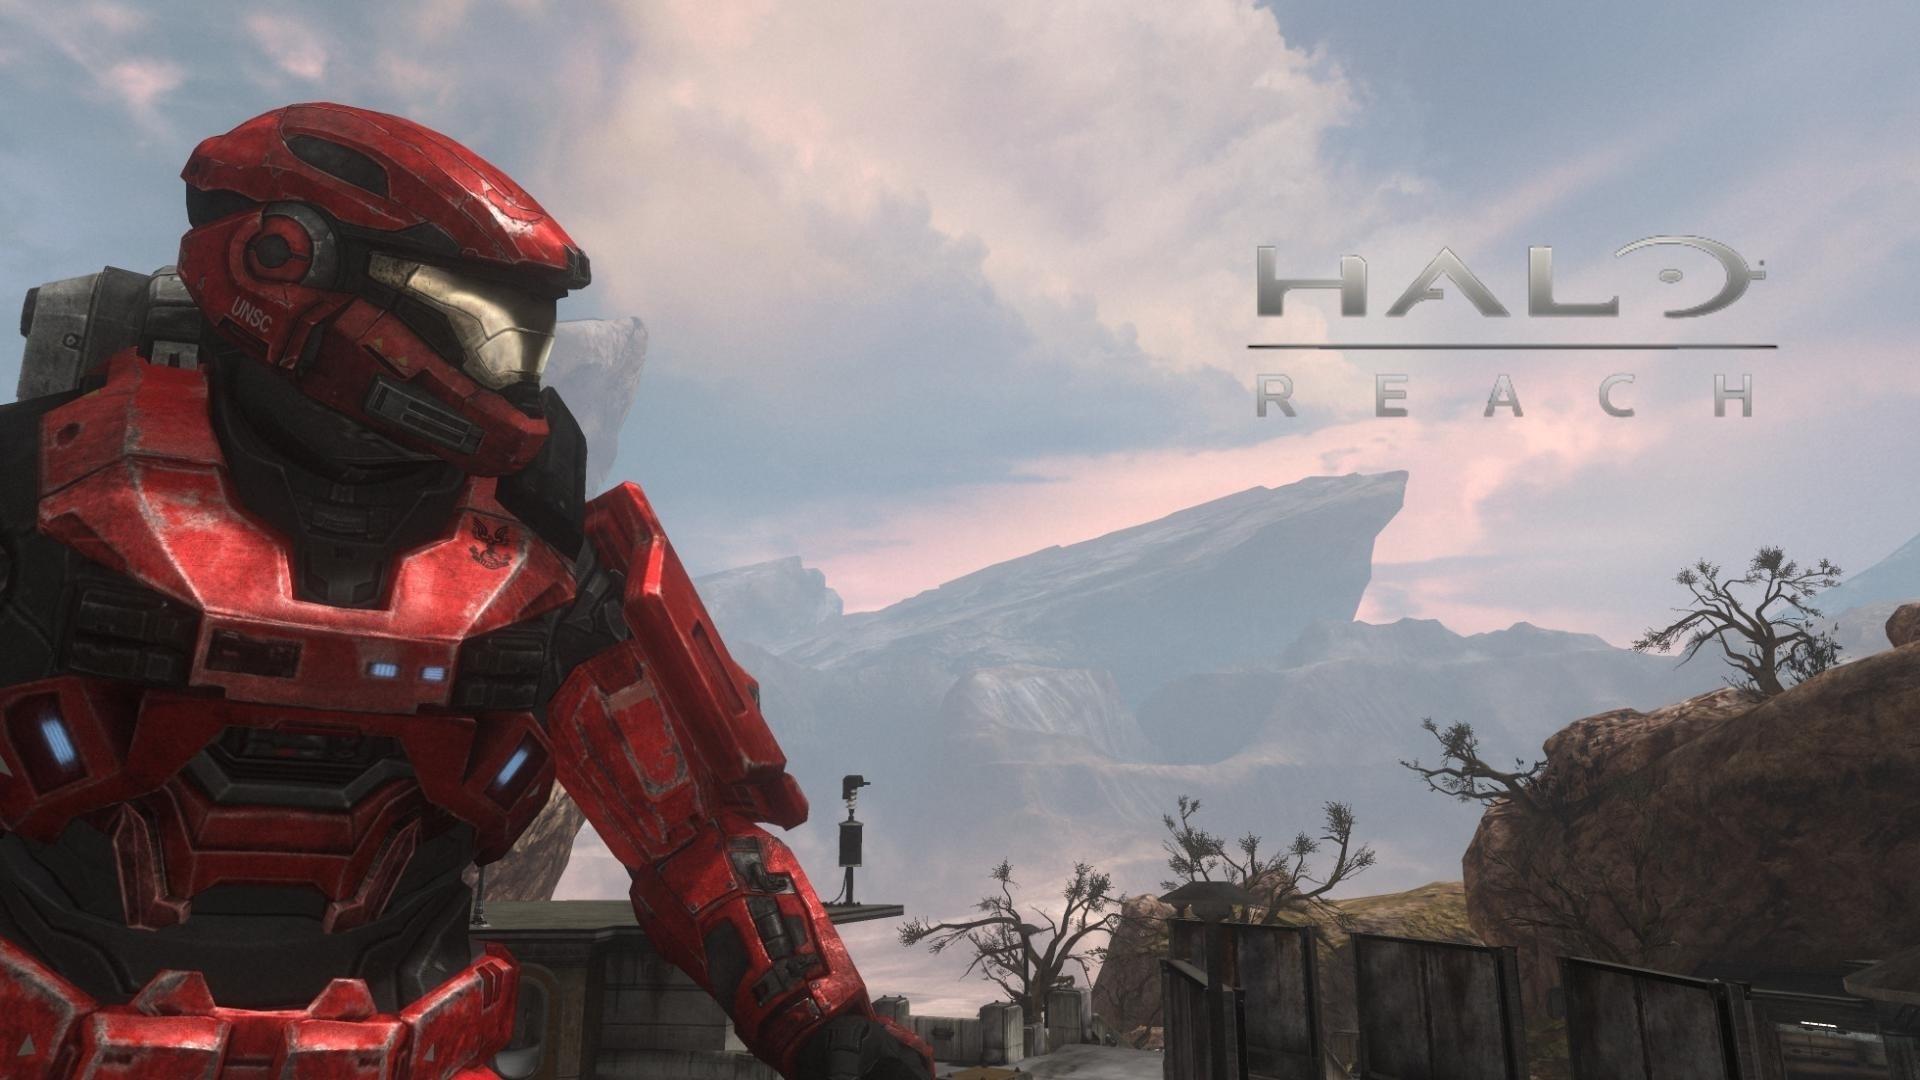 Halo Reach Wallpaper theme